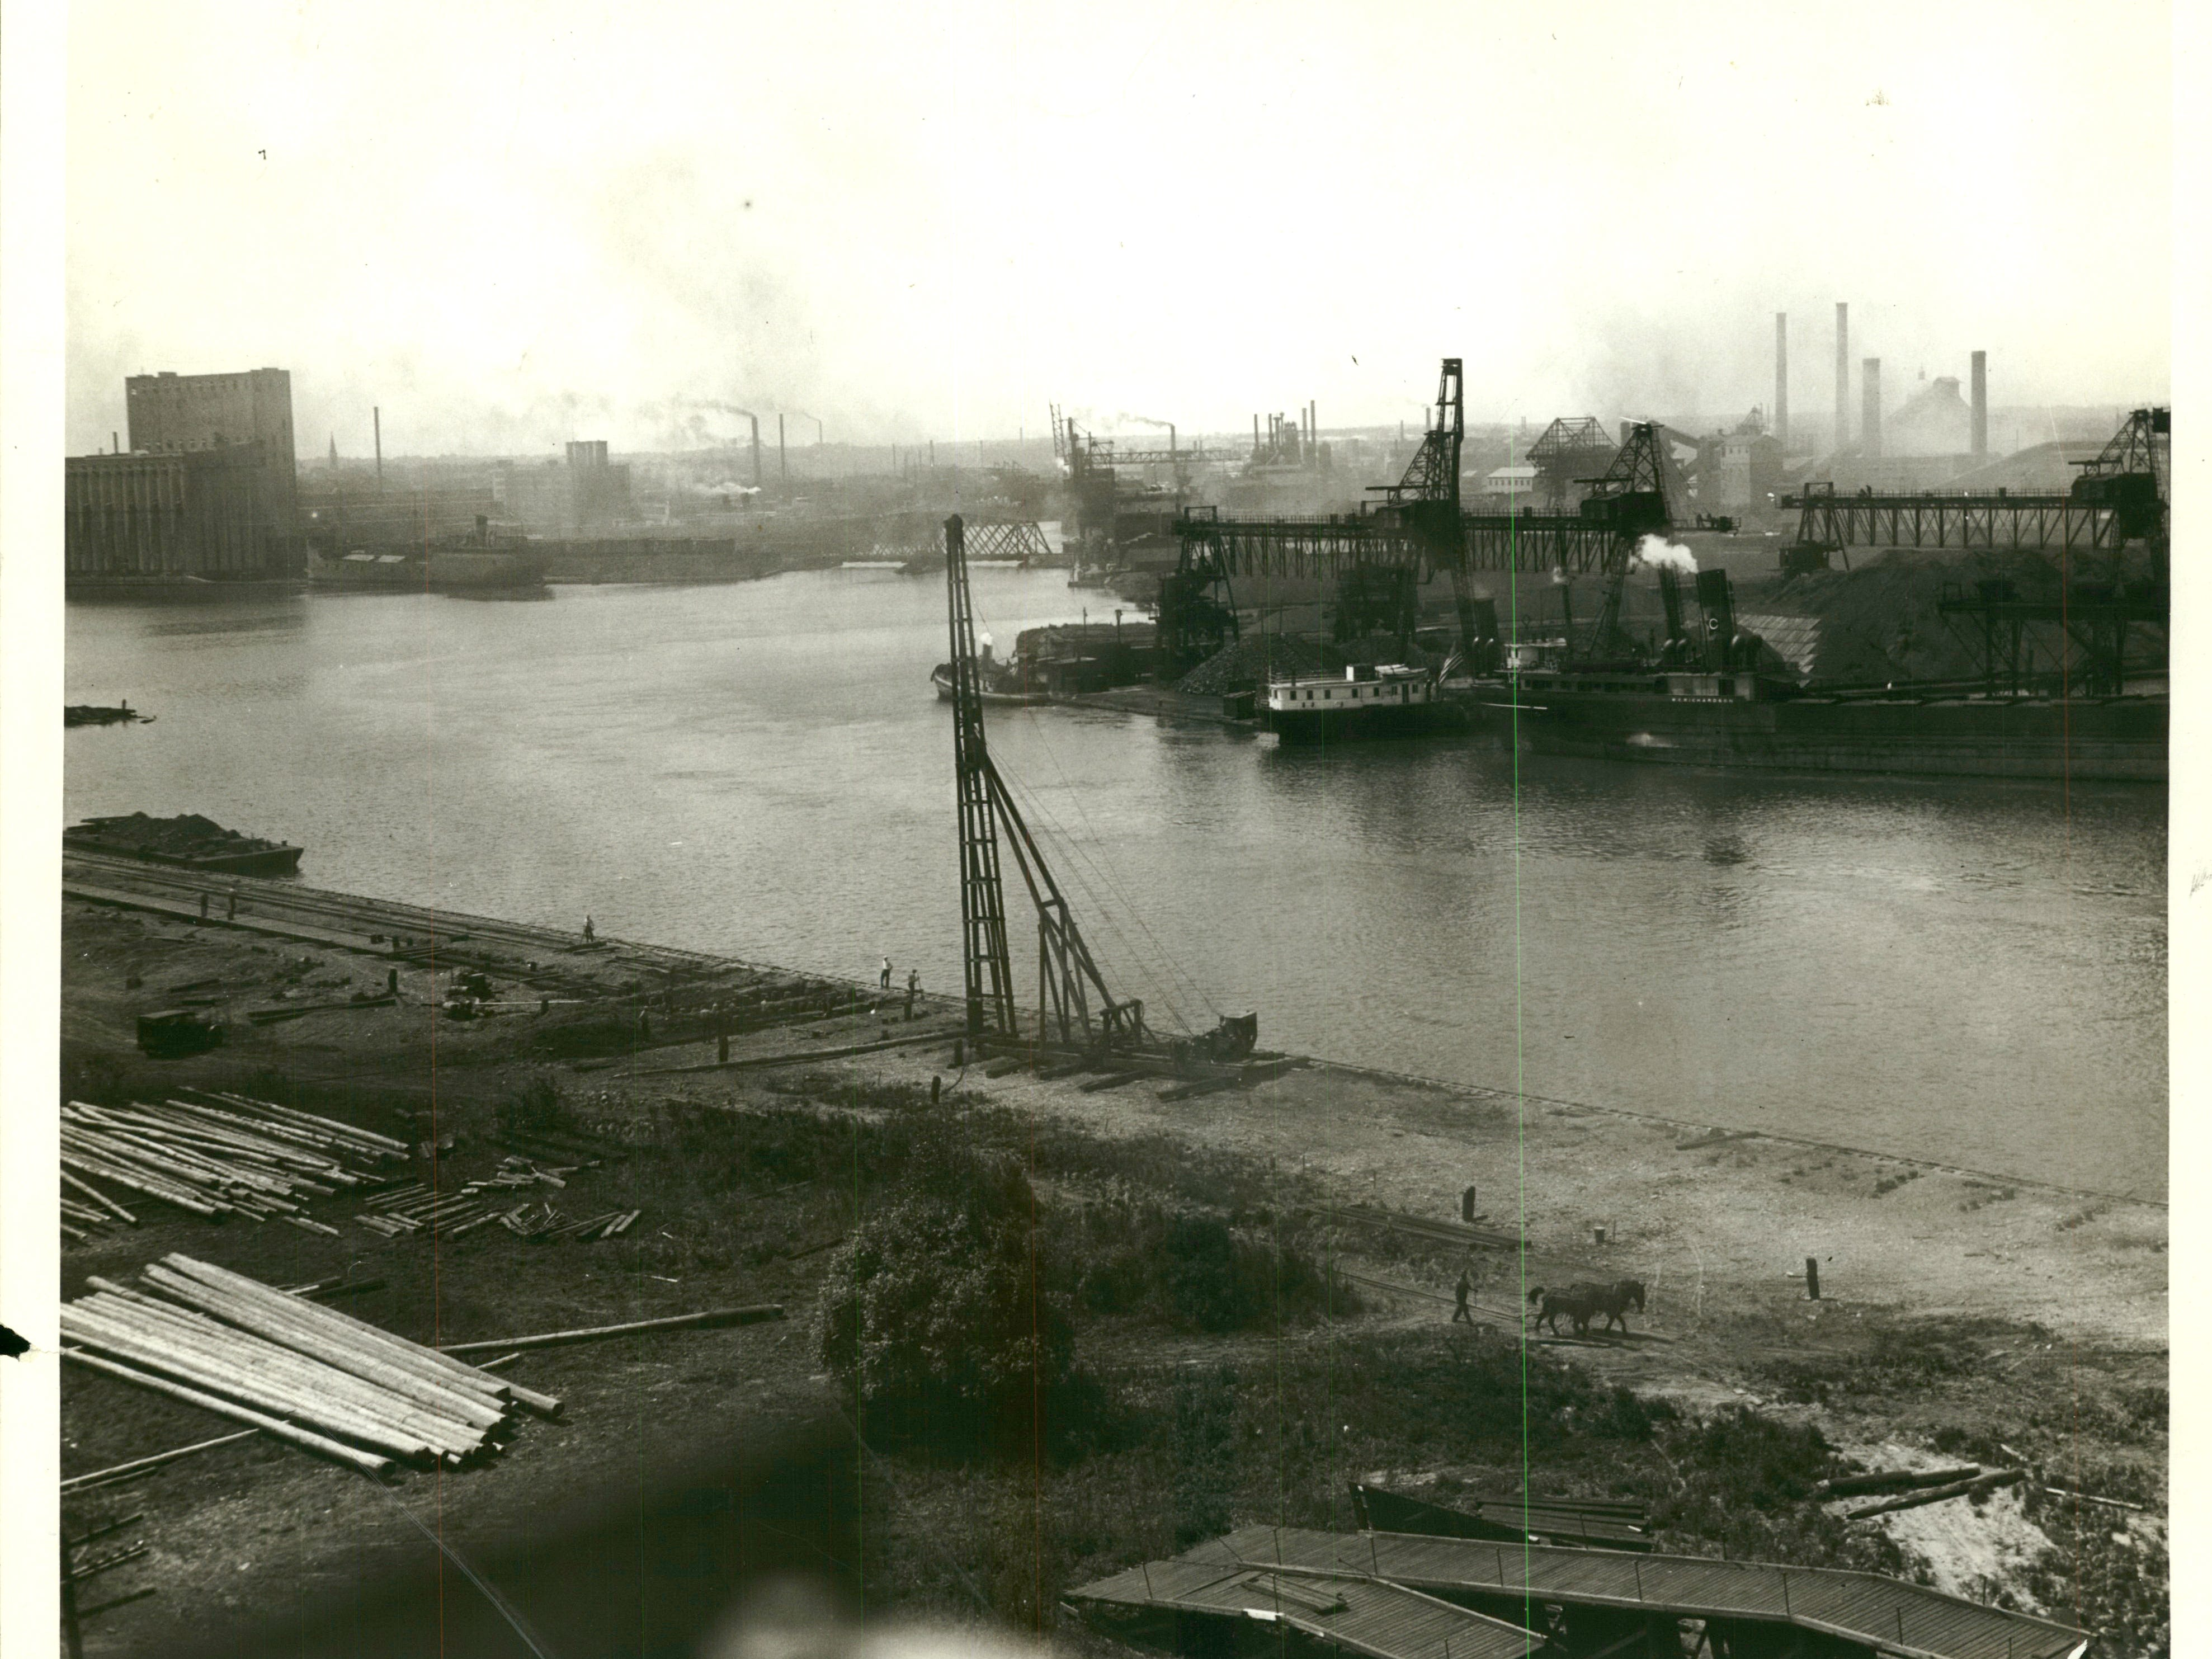 (Jones Island - Track - Docks) Jones Island Park and Docks, Aerial view